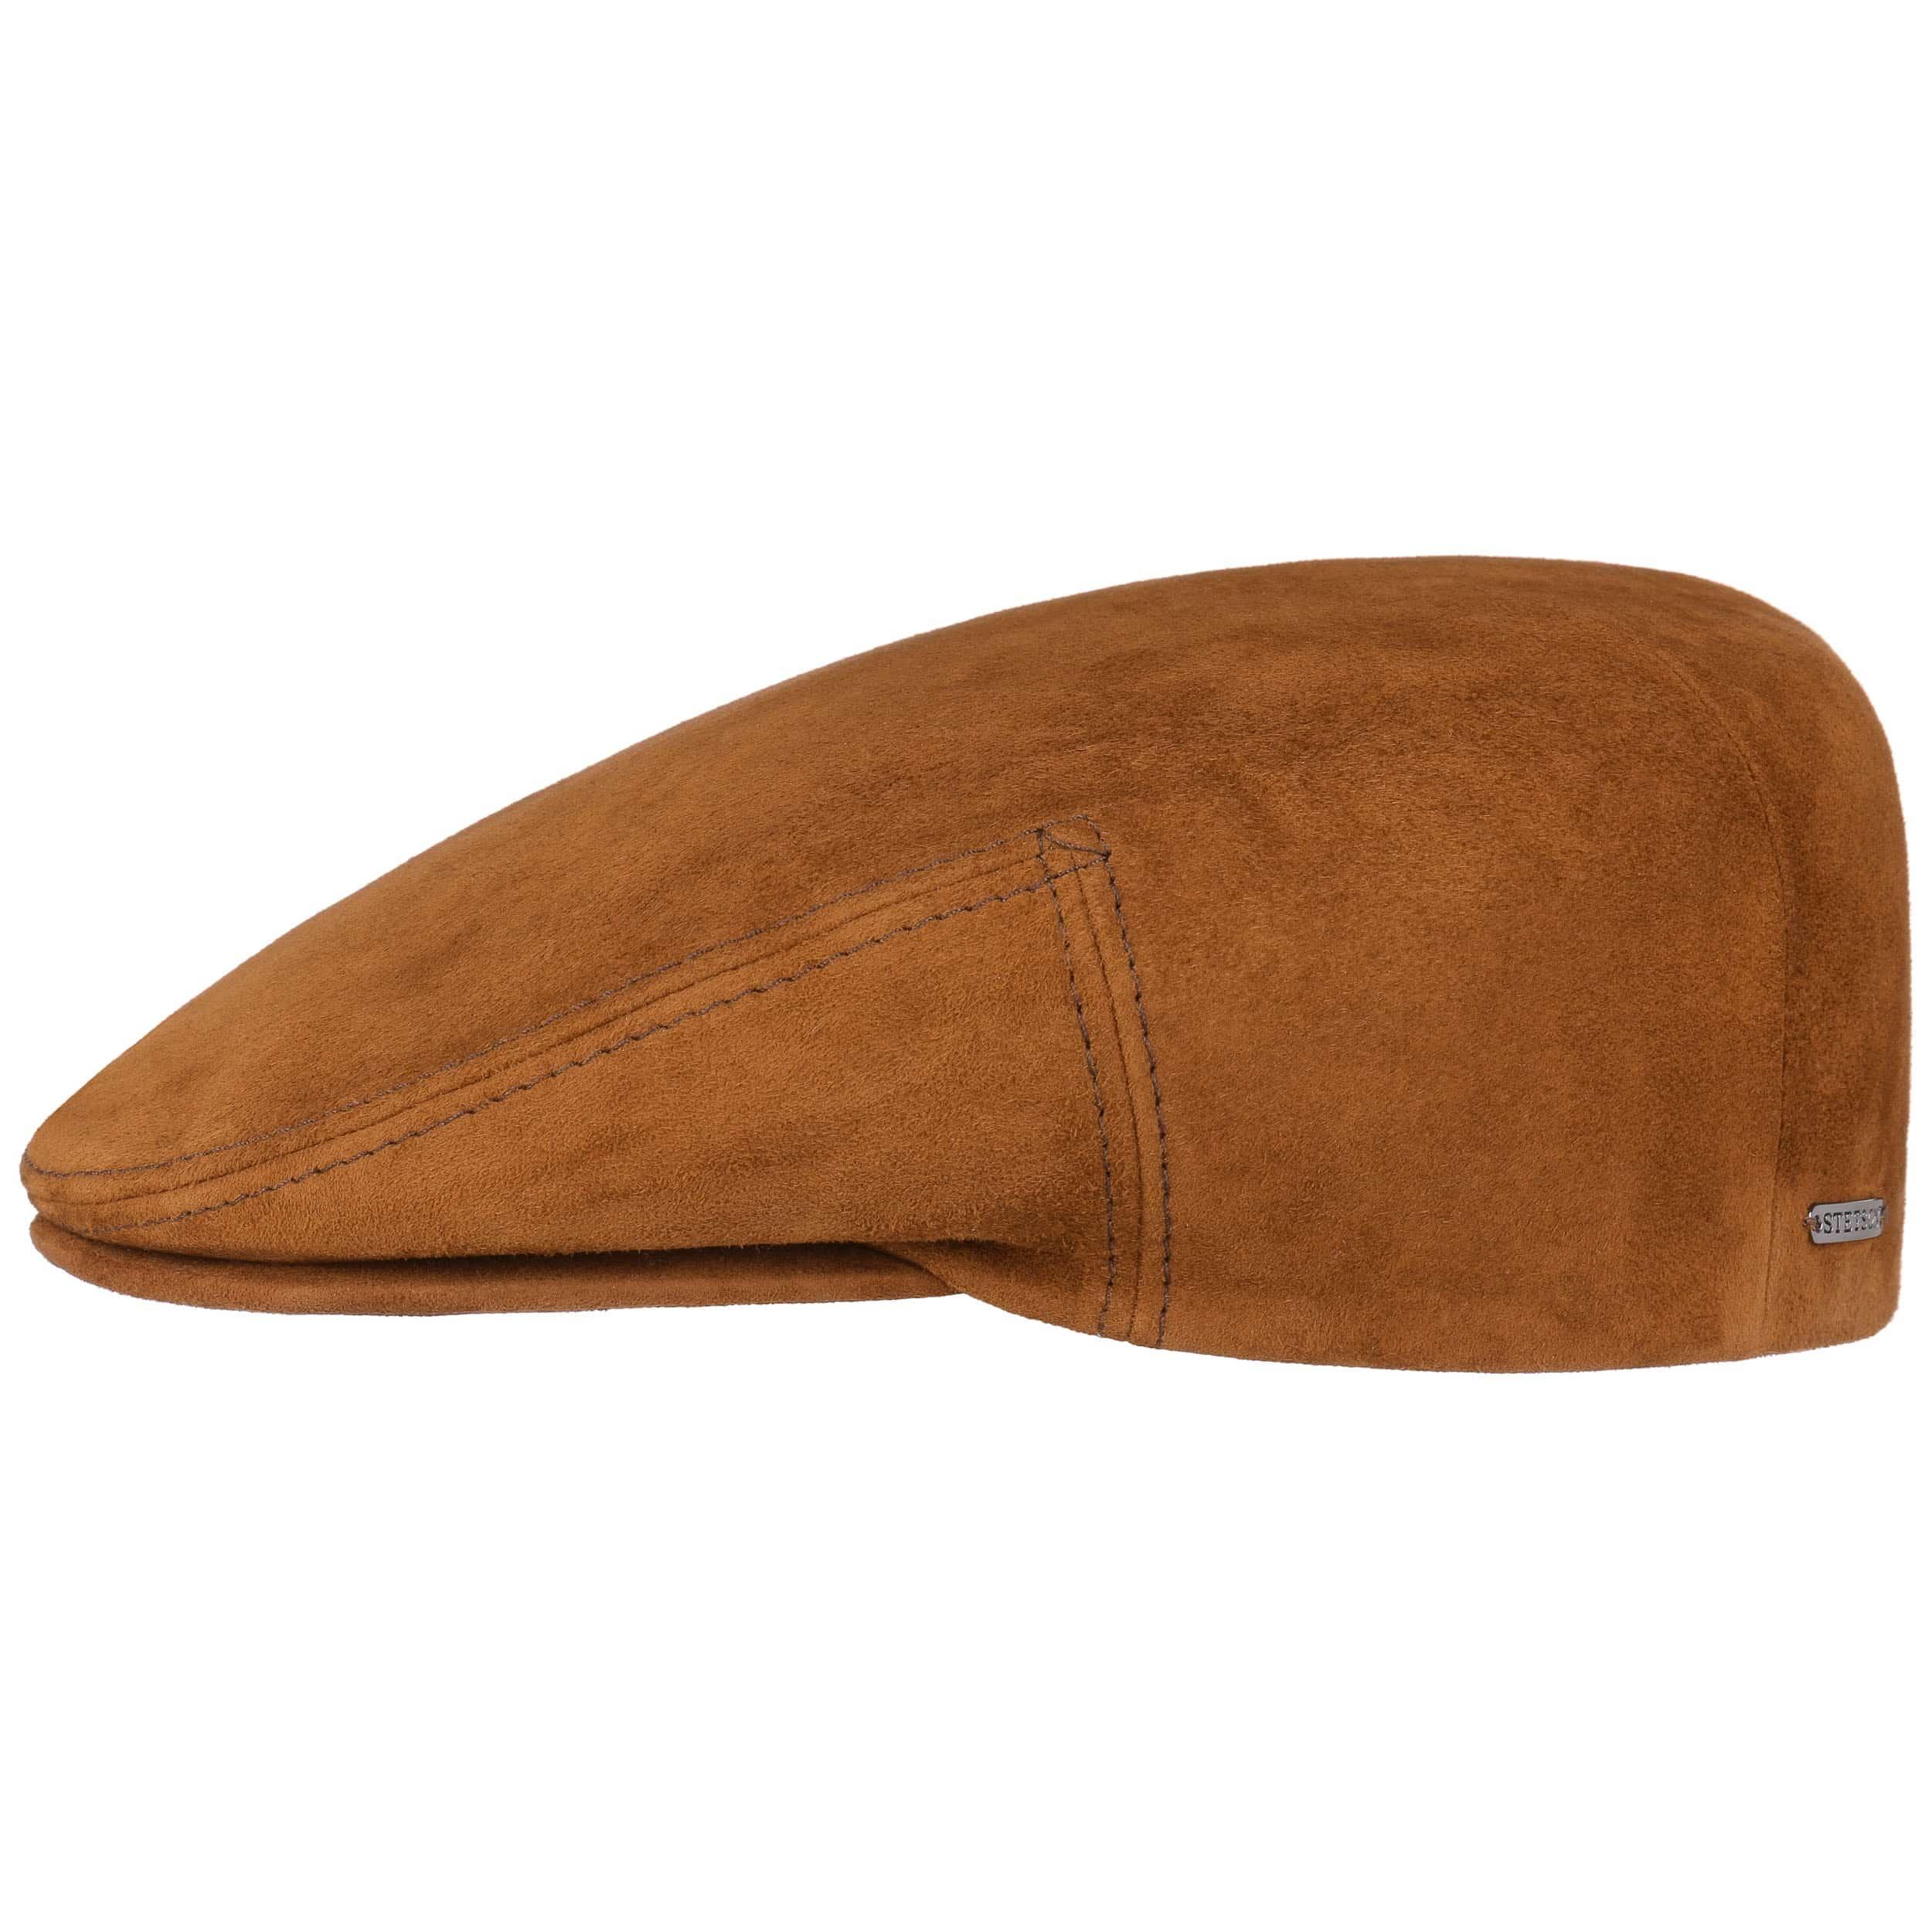 e94e7890cf3 ... Kent Goat Leather Flat Cap by Stetson - cognac 1 ...